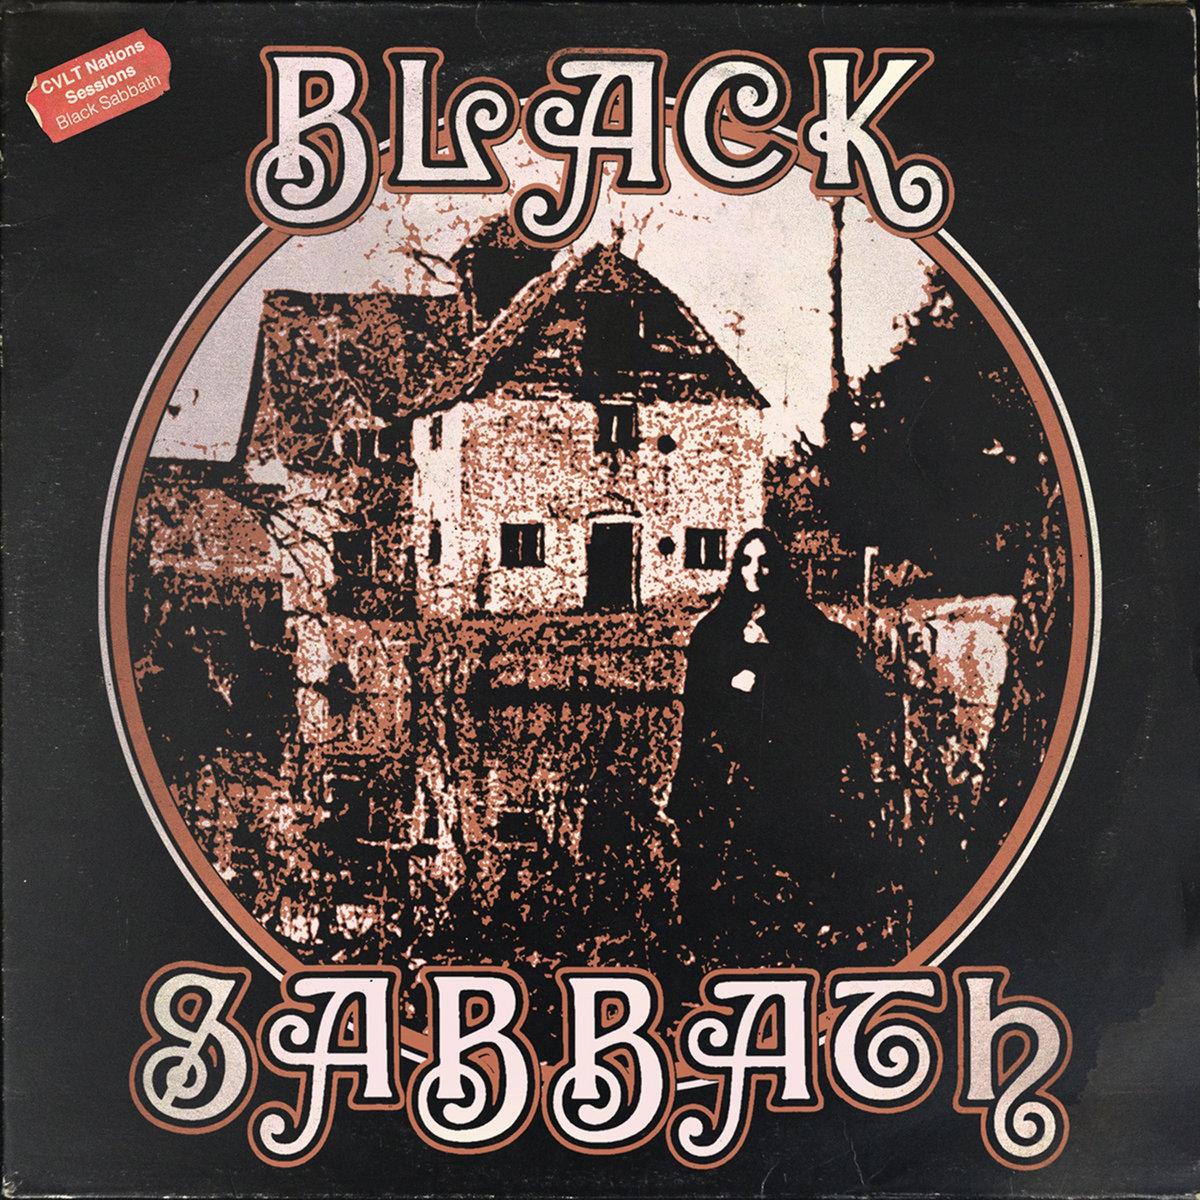 N.i.b black sabbath скачать